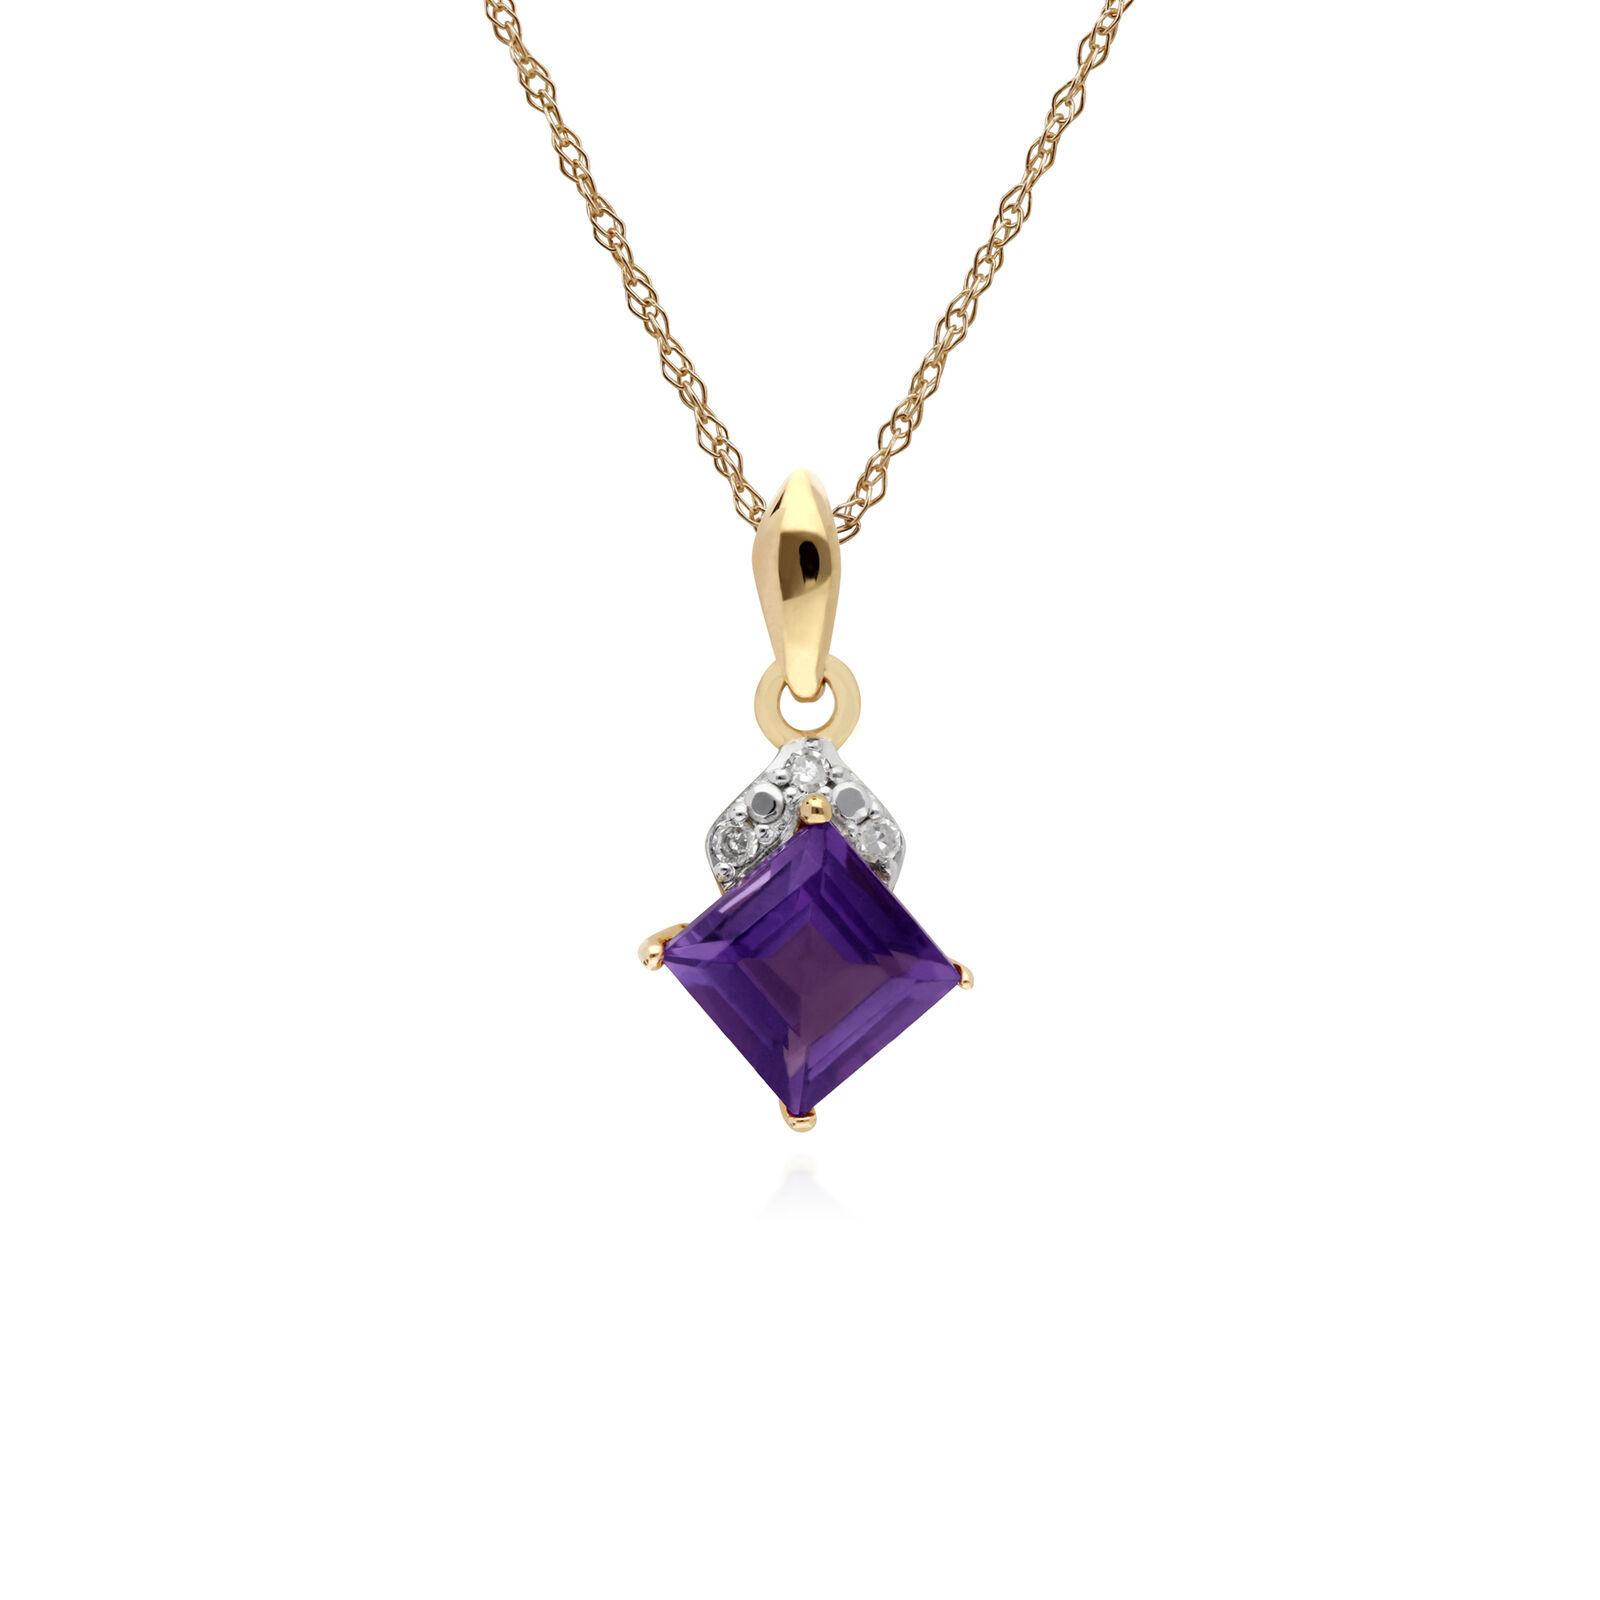 Gemondo 9ct Yellow gold Amethyst & Diamond Square Pendant on 45cm Chain